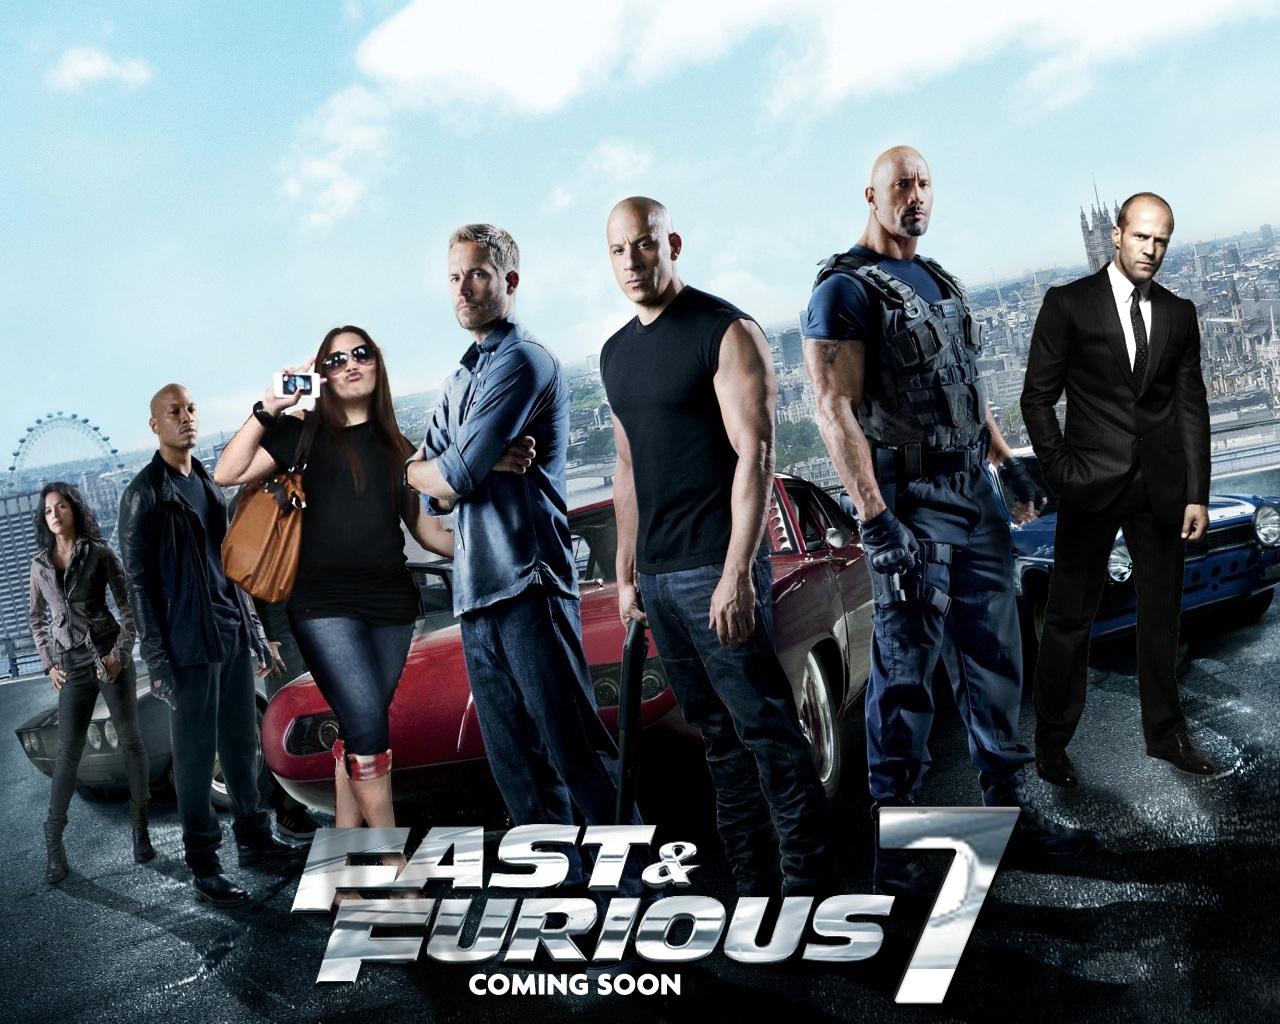 Fast-Furious-7.jpg